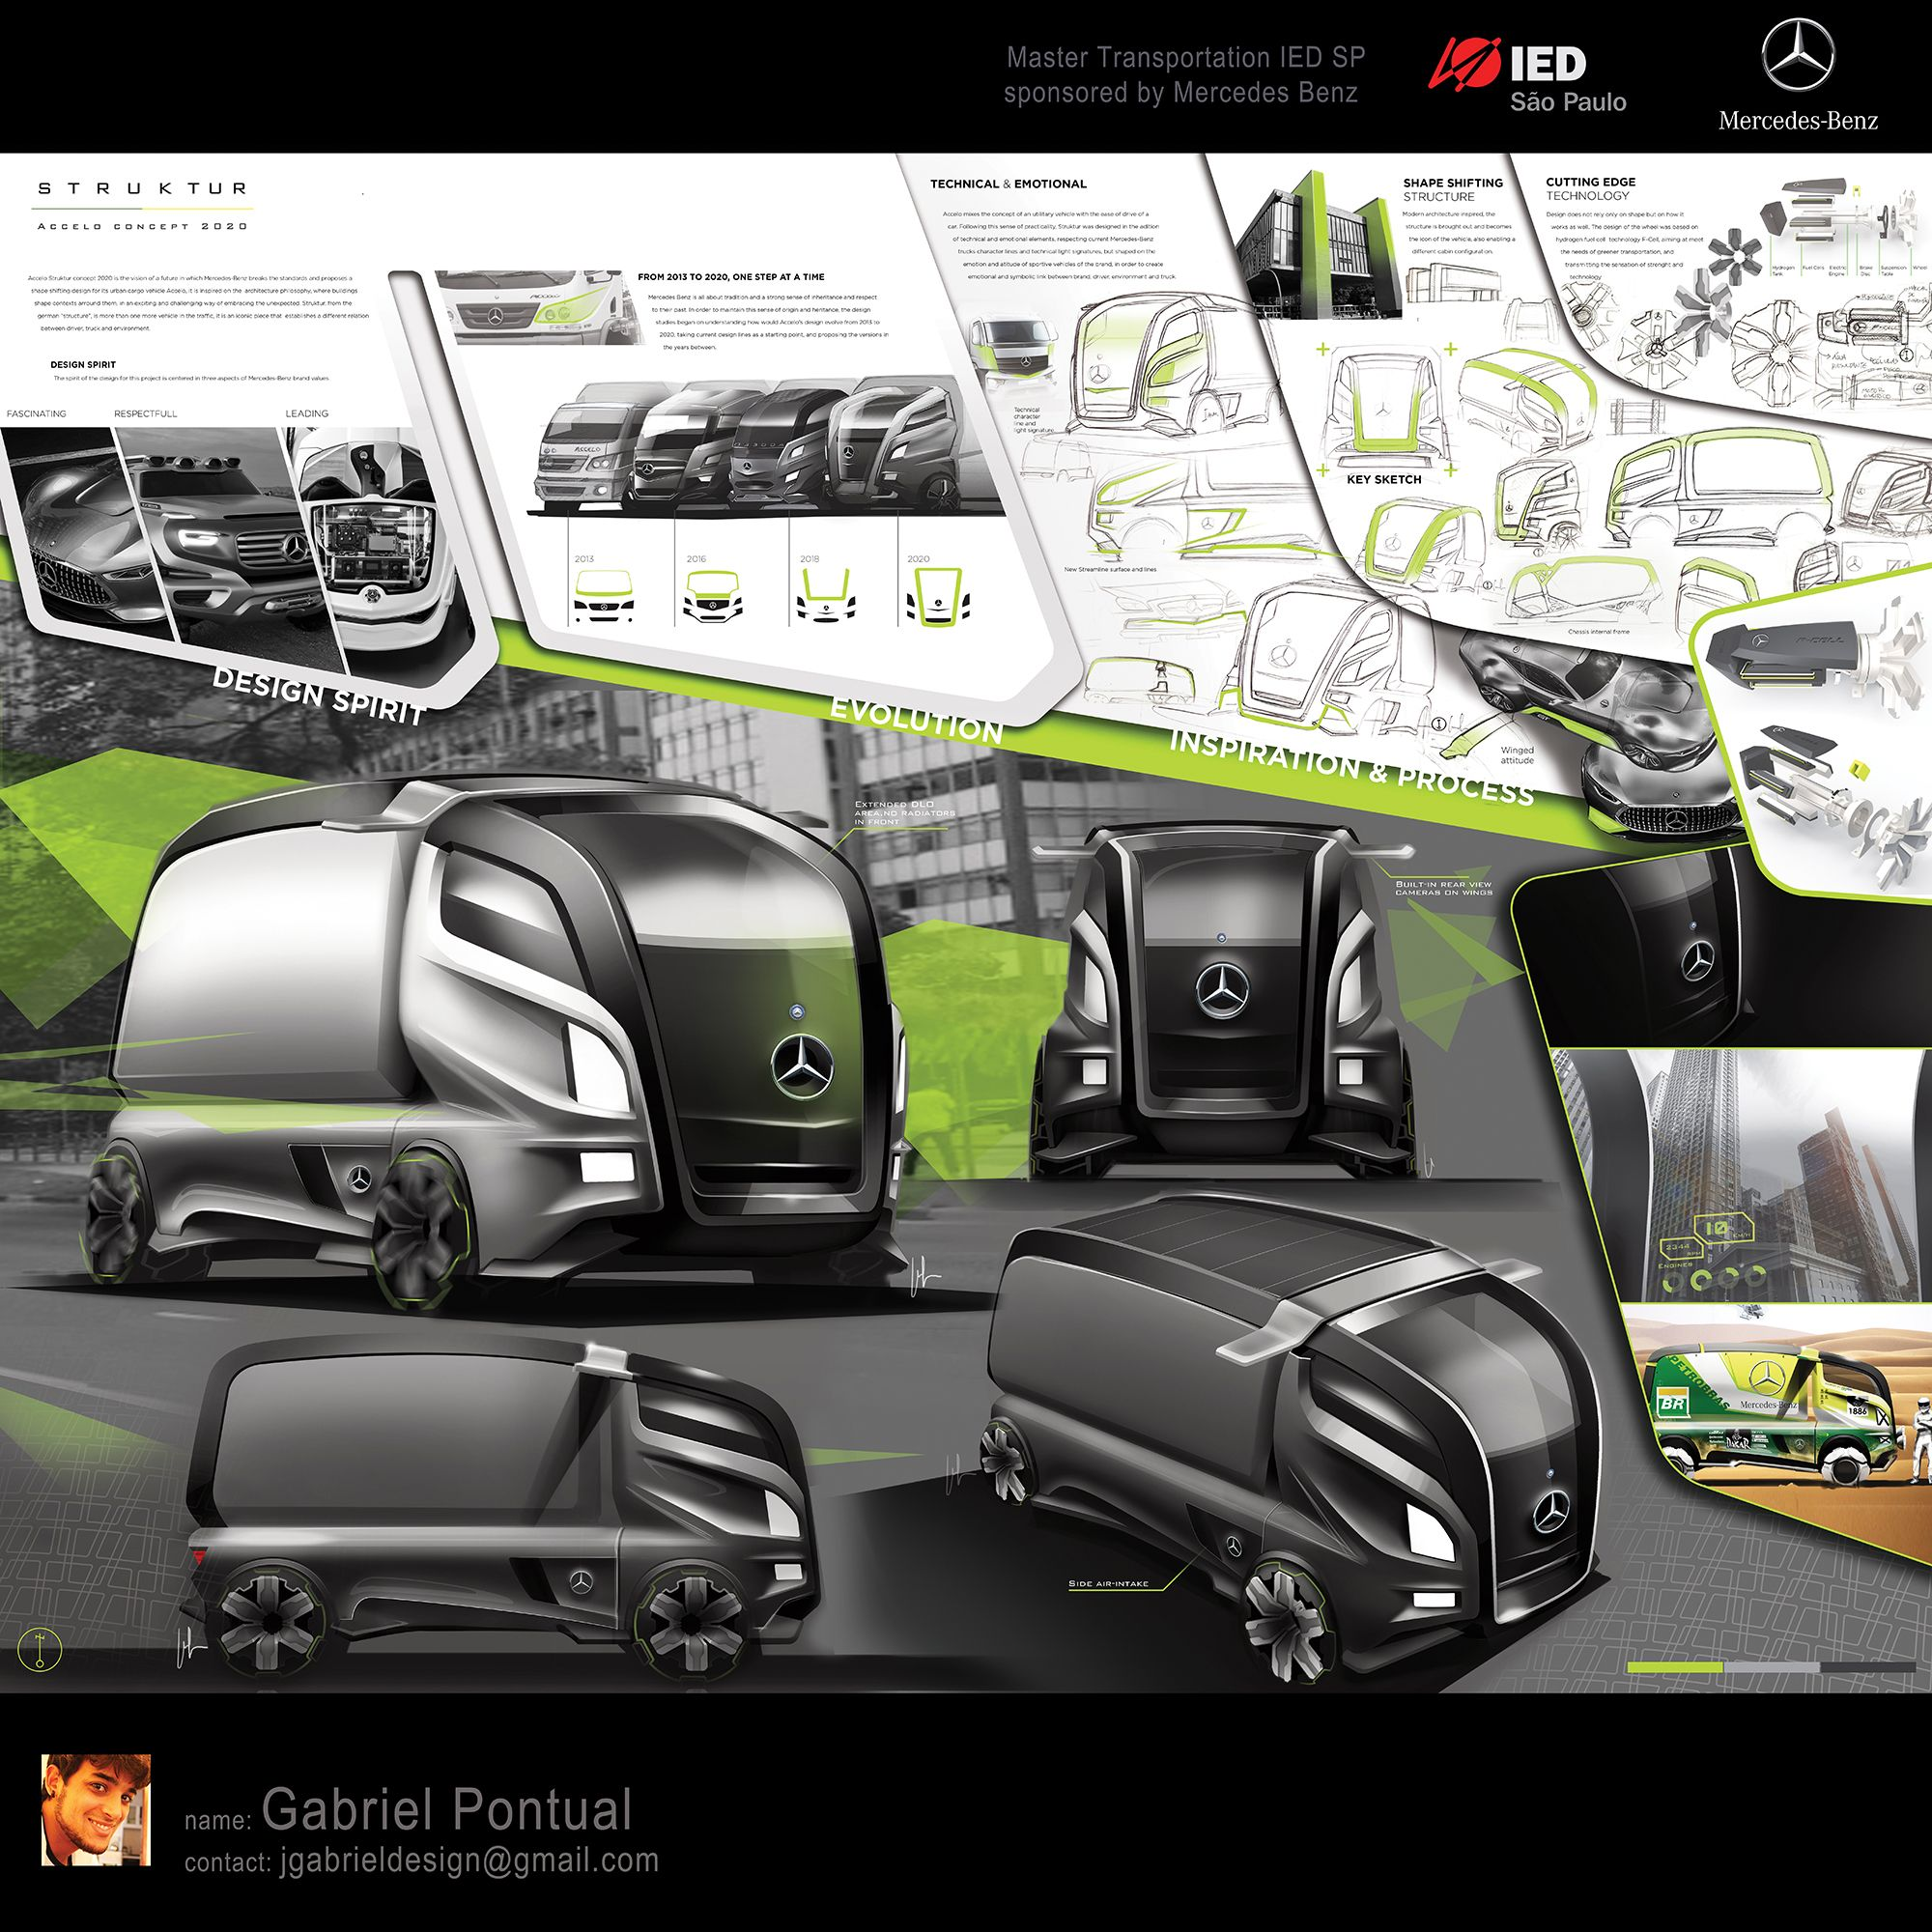 IED + Mercedes-Benz Sponsored Degree Project - Accelo Struktur Concept 2020